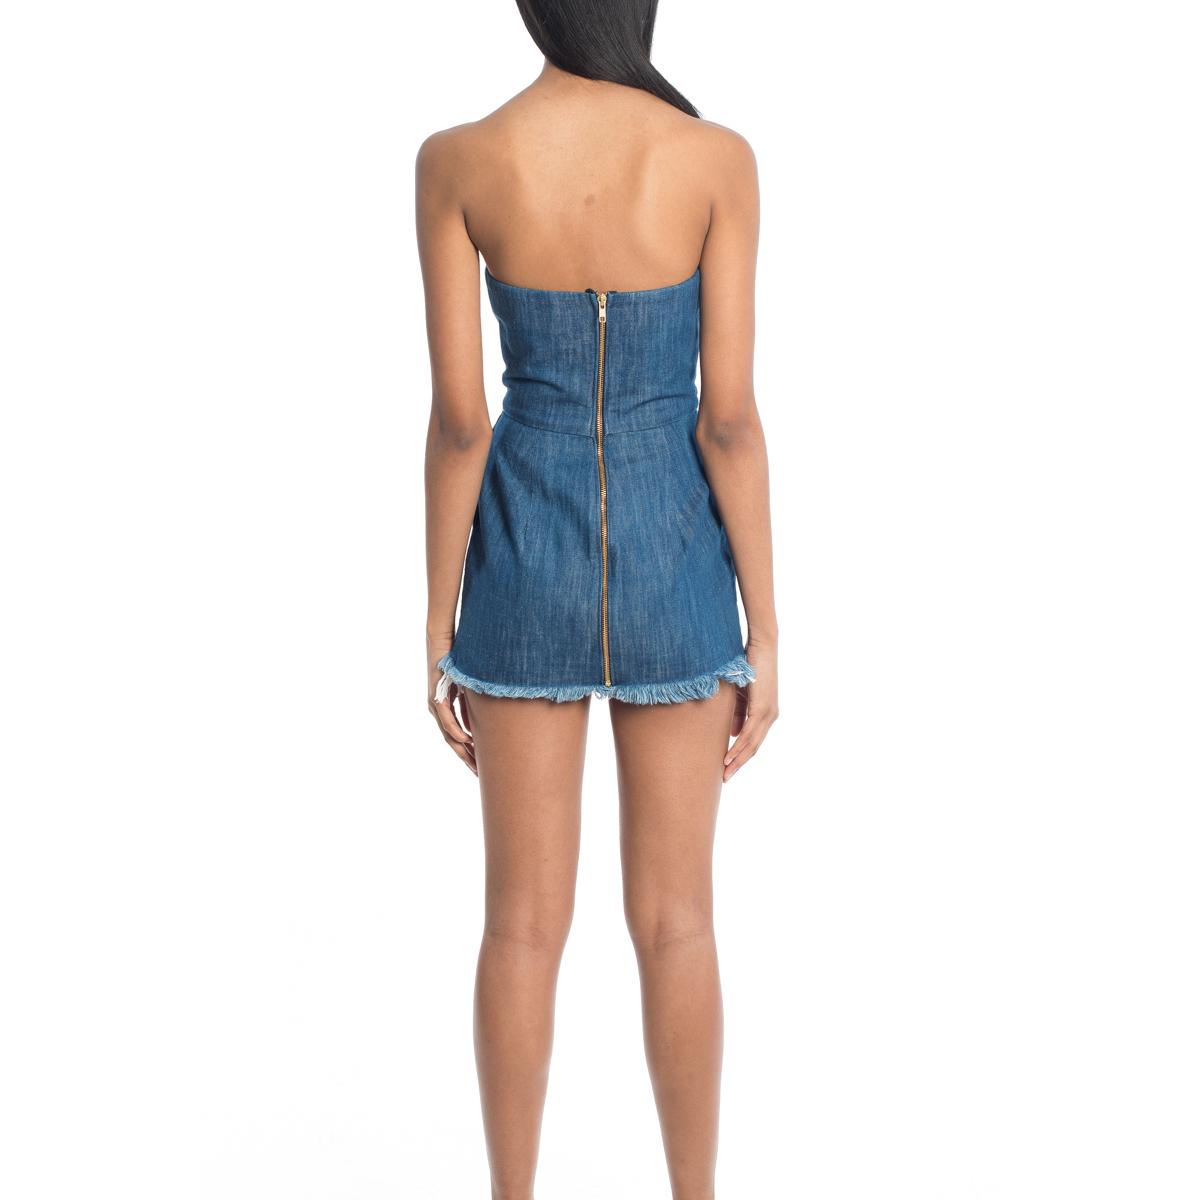 Chaka Denim Fringe Dress